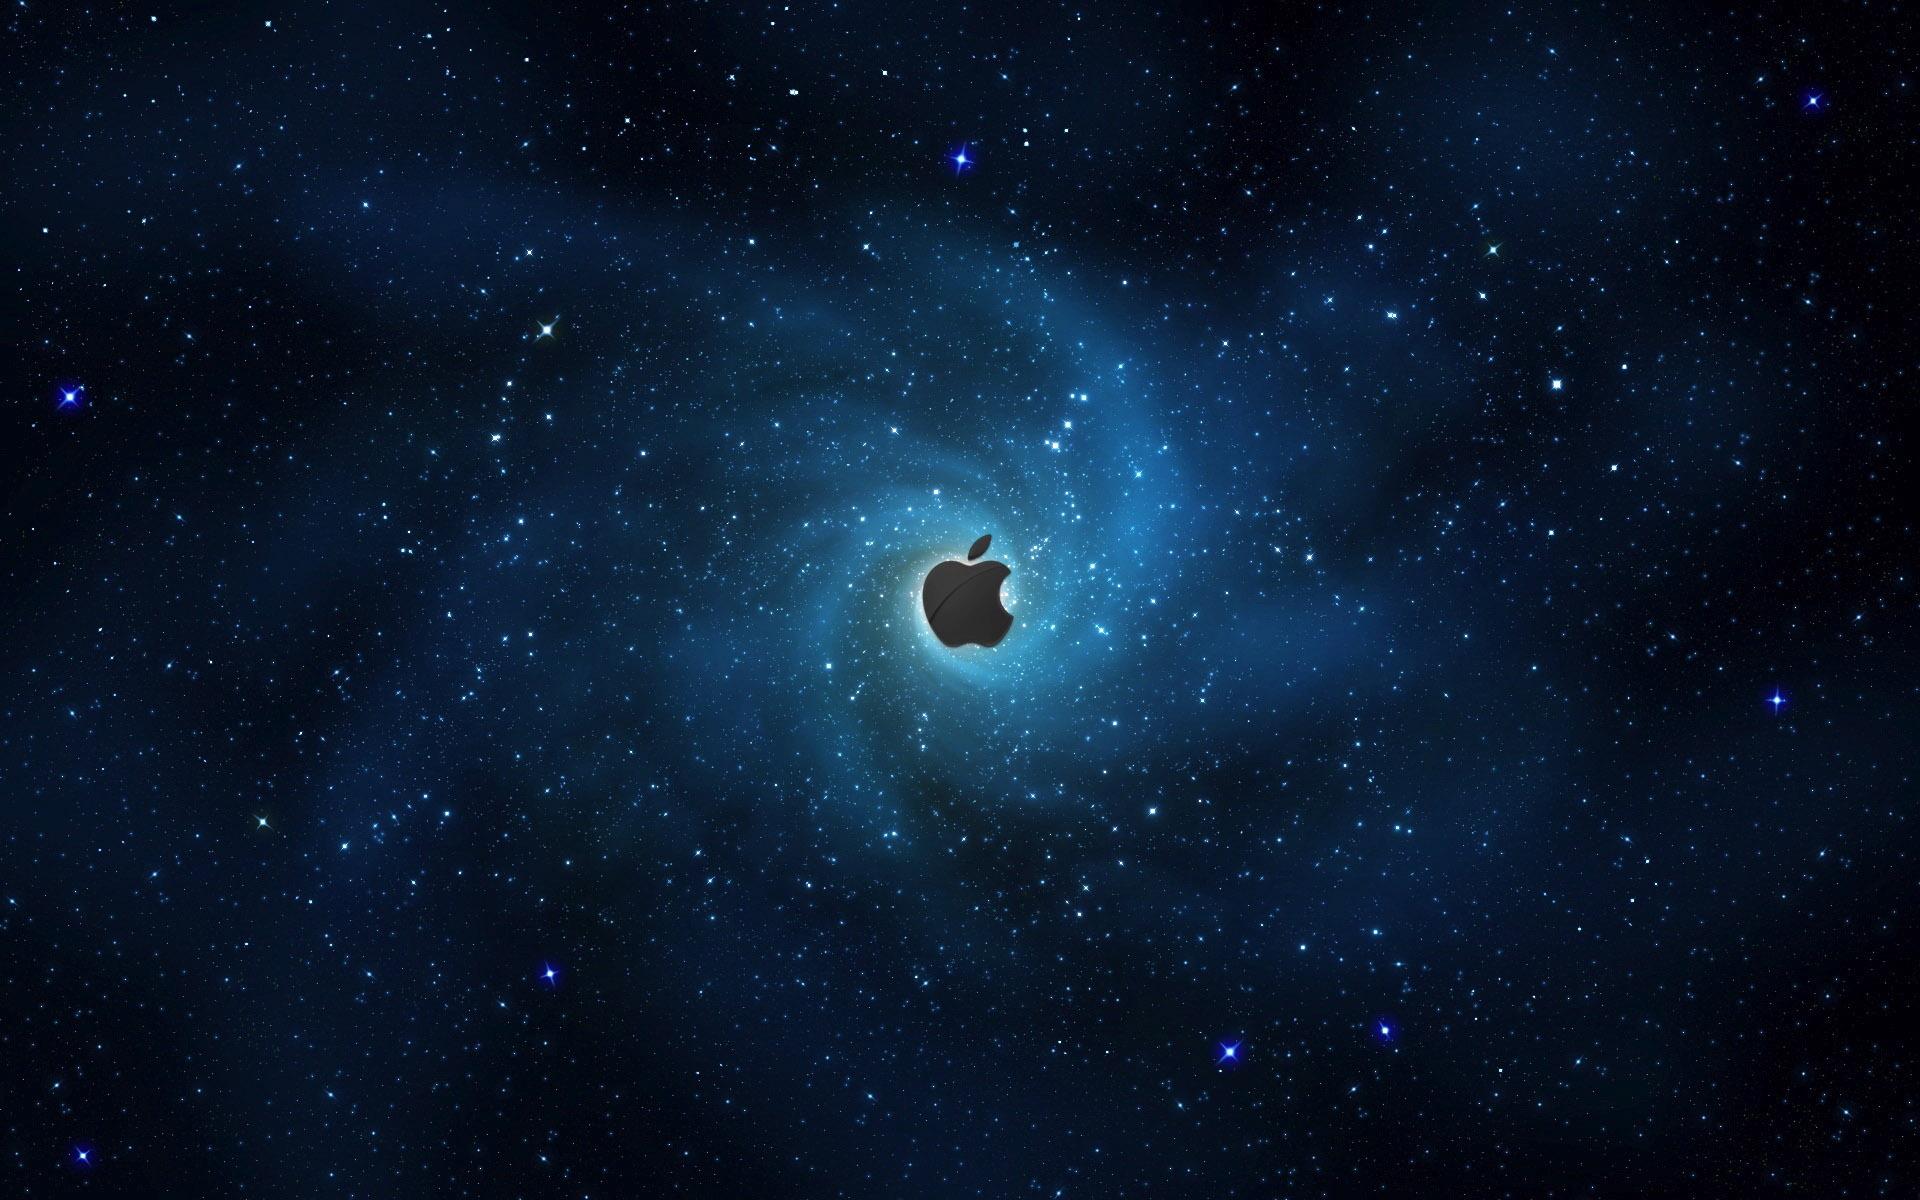 apple hd pictures apple hd pictures apple hd images apple 1920x1200